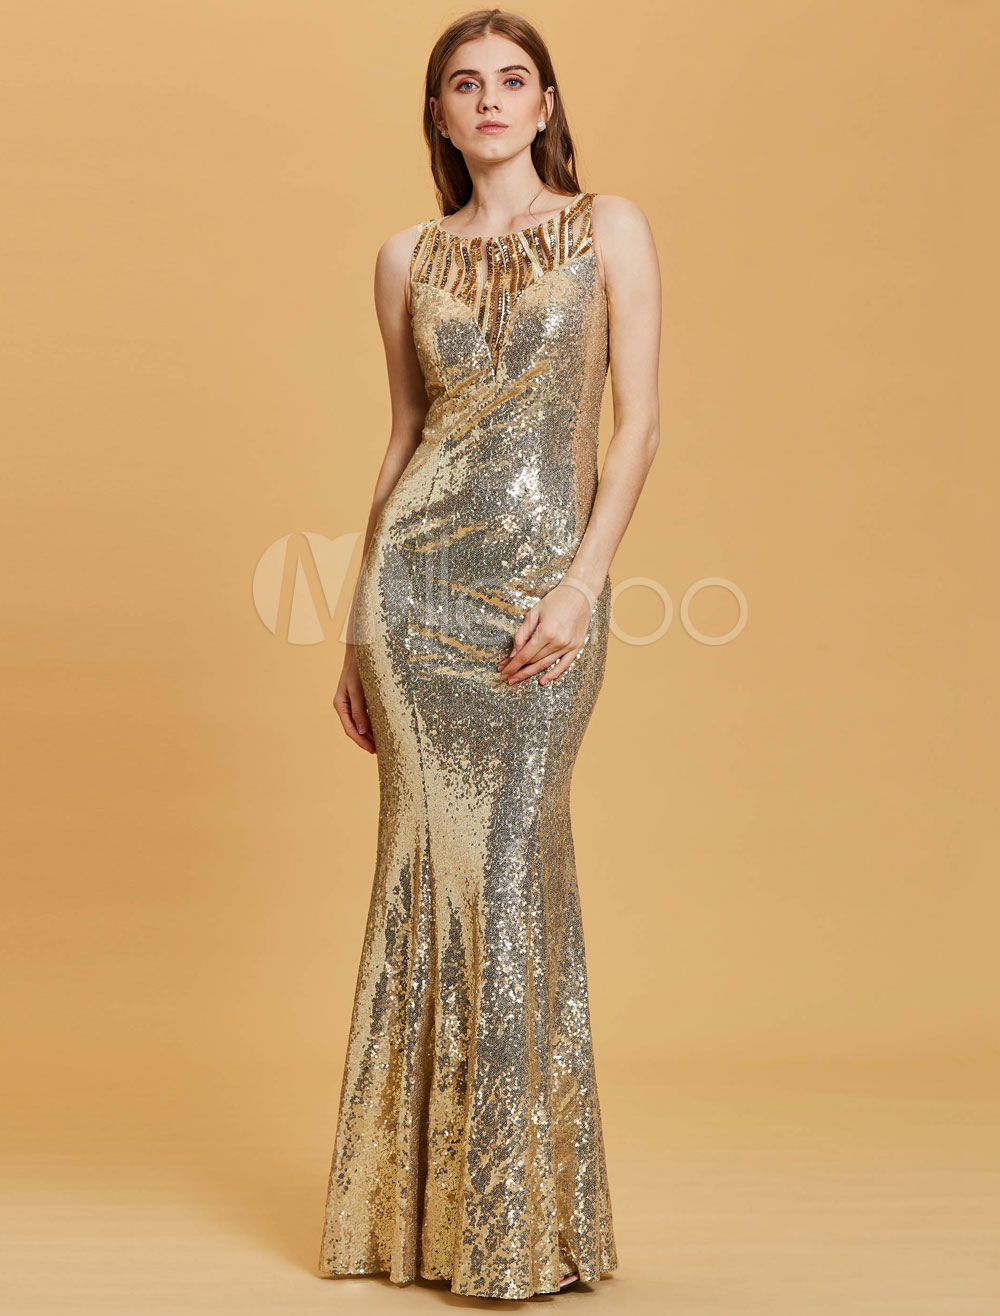 Sequin Prom Dresses Light Gold Mermaid Long Evening Dress Glitter Floor Length Formal Dress